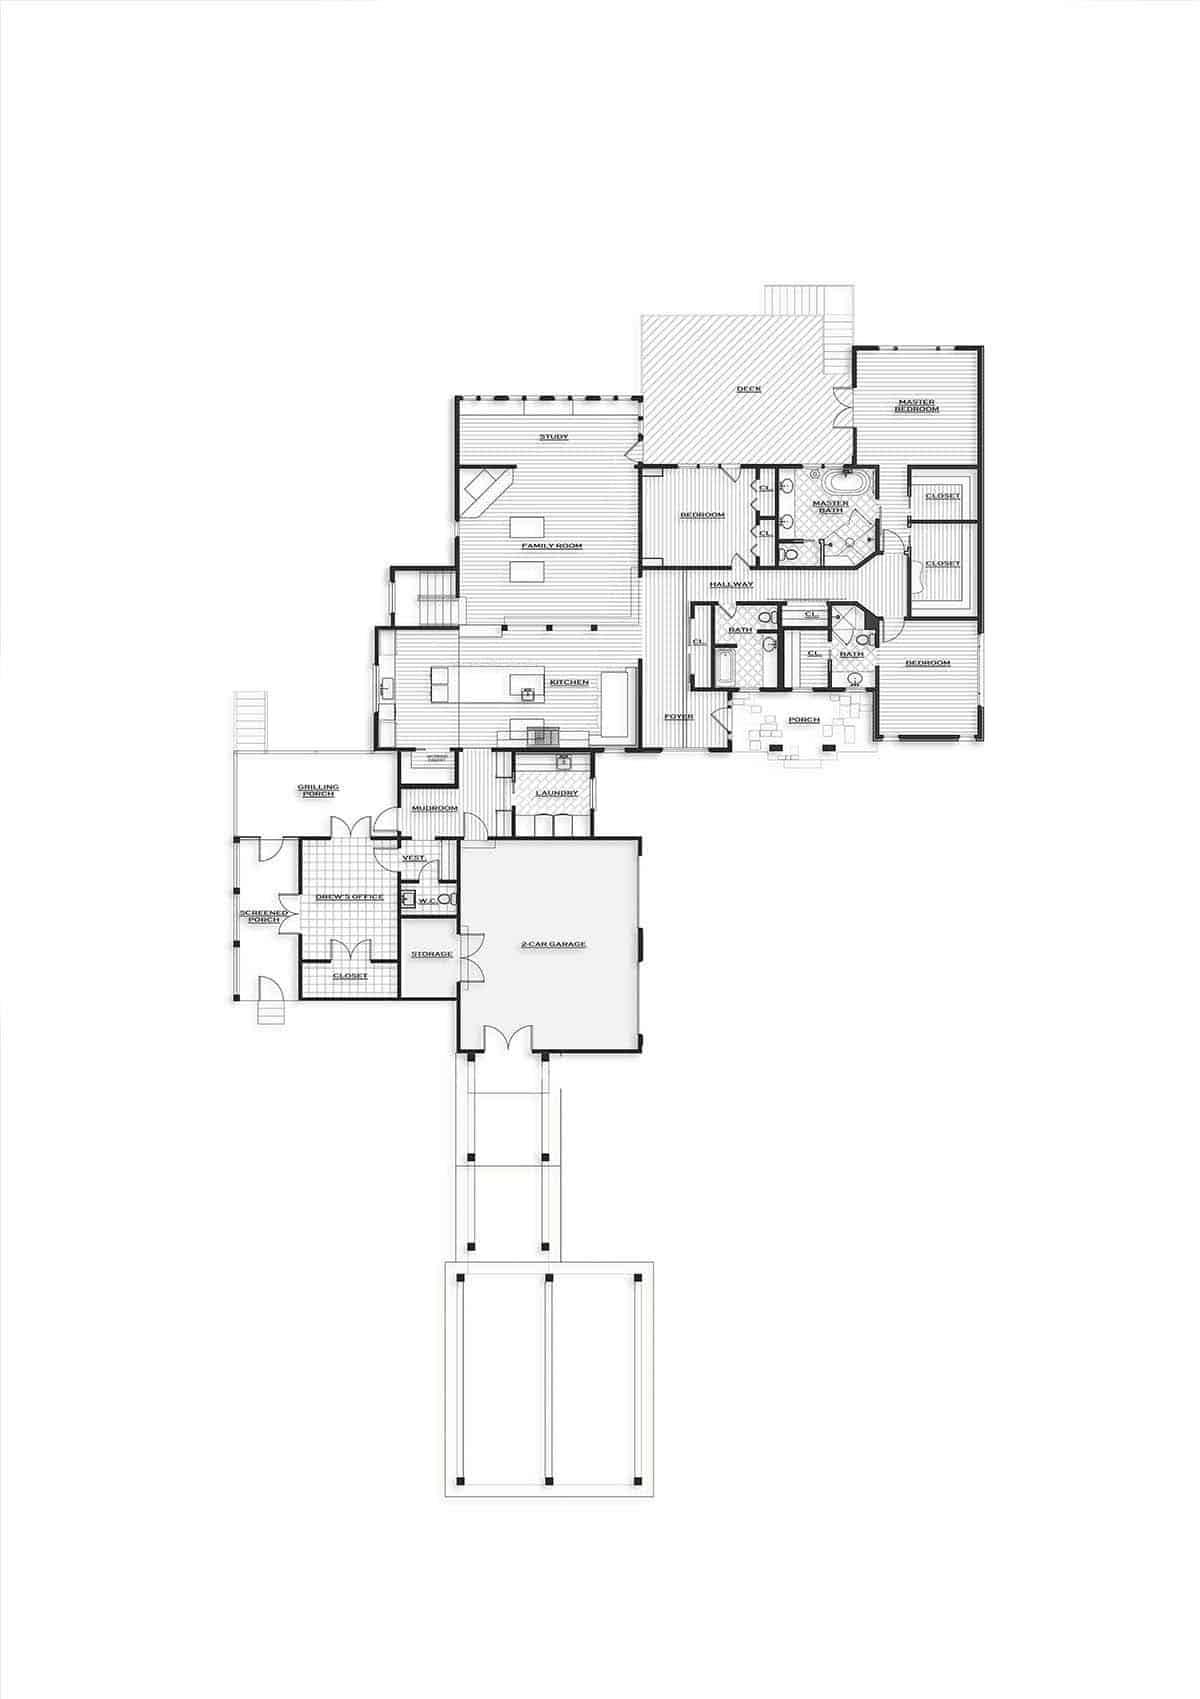 ranch-home-main-floor-plan